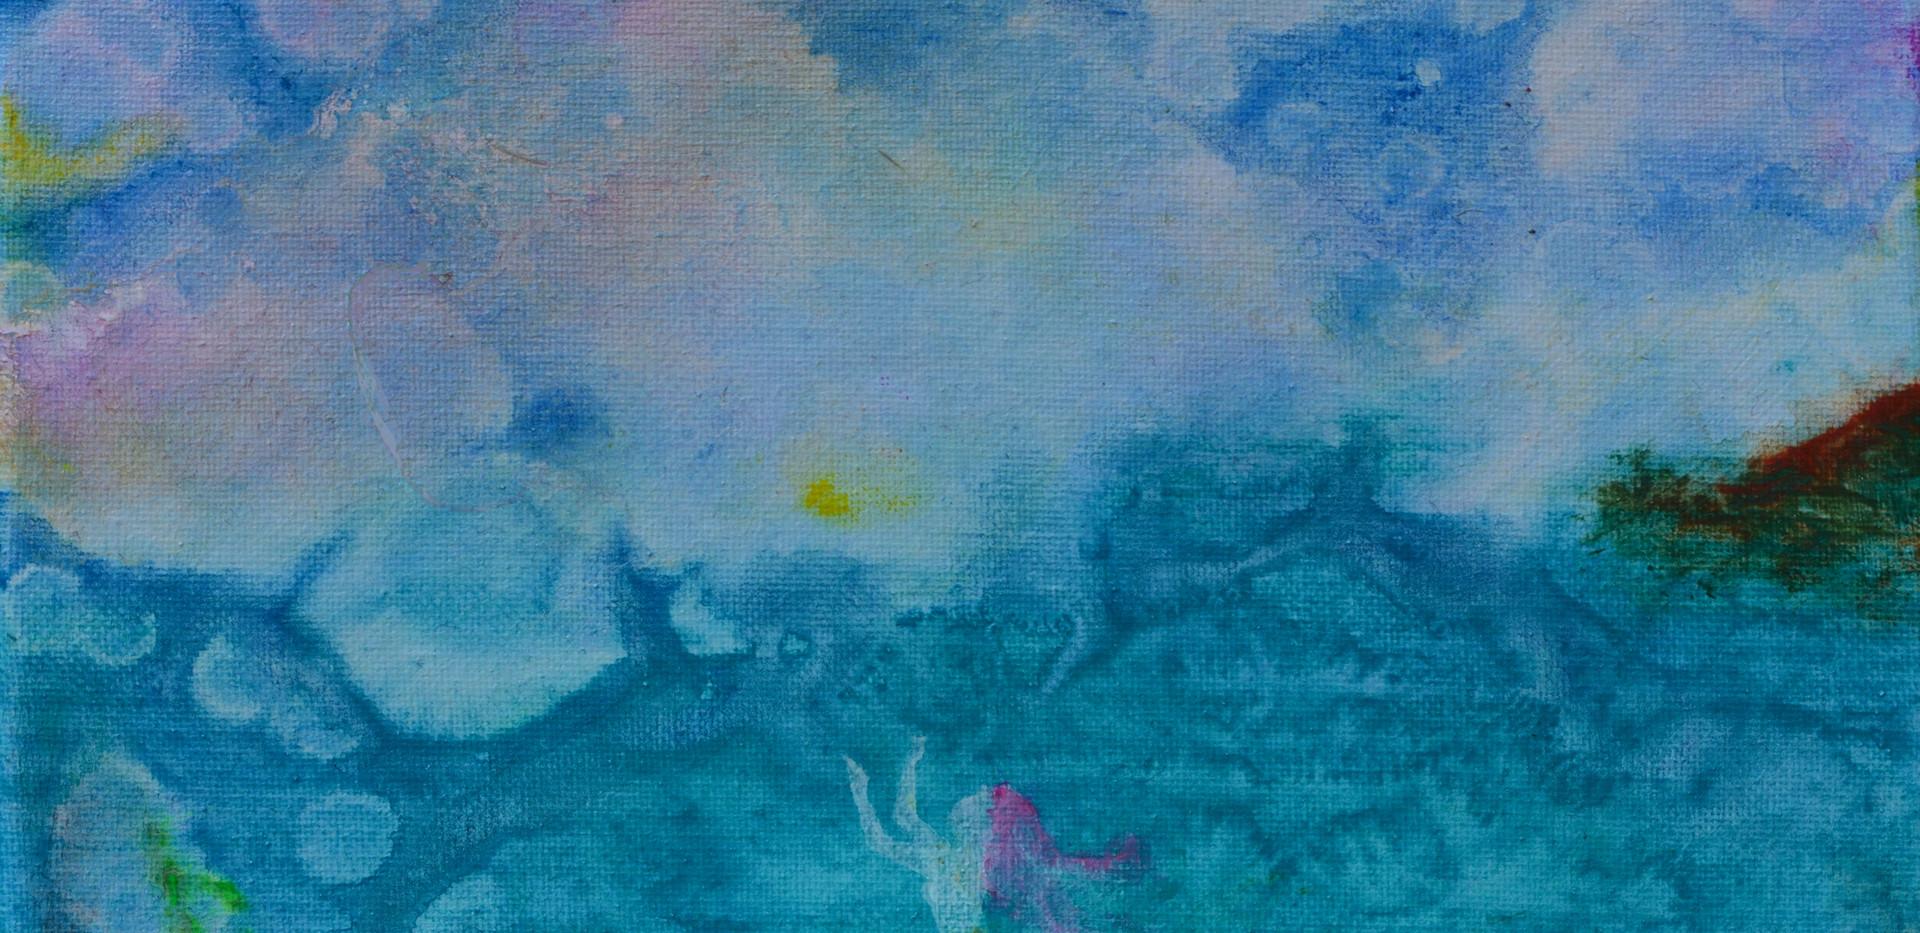 Alys Caviness-Gober, Dreamscape 8 Mermaid